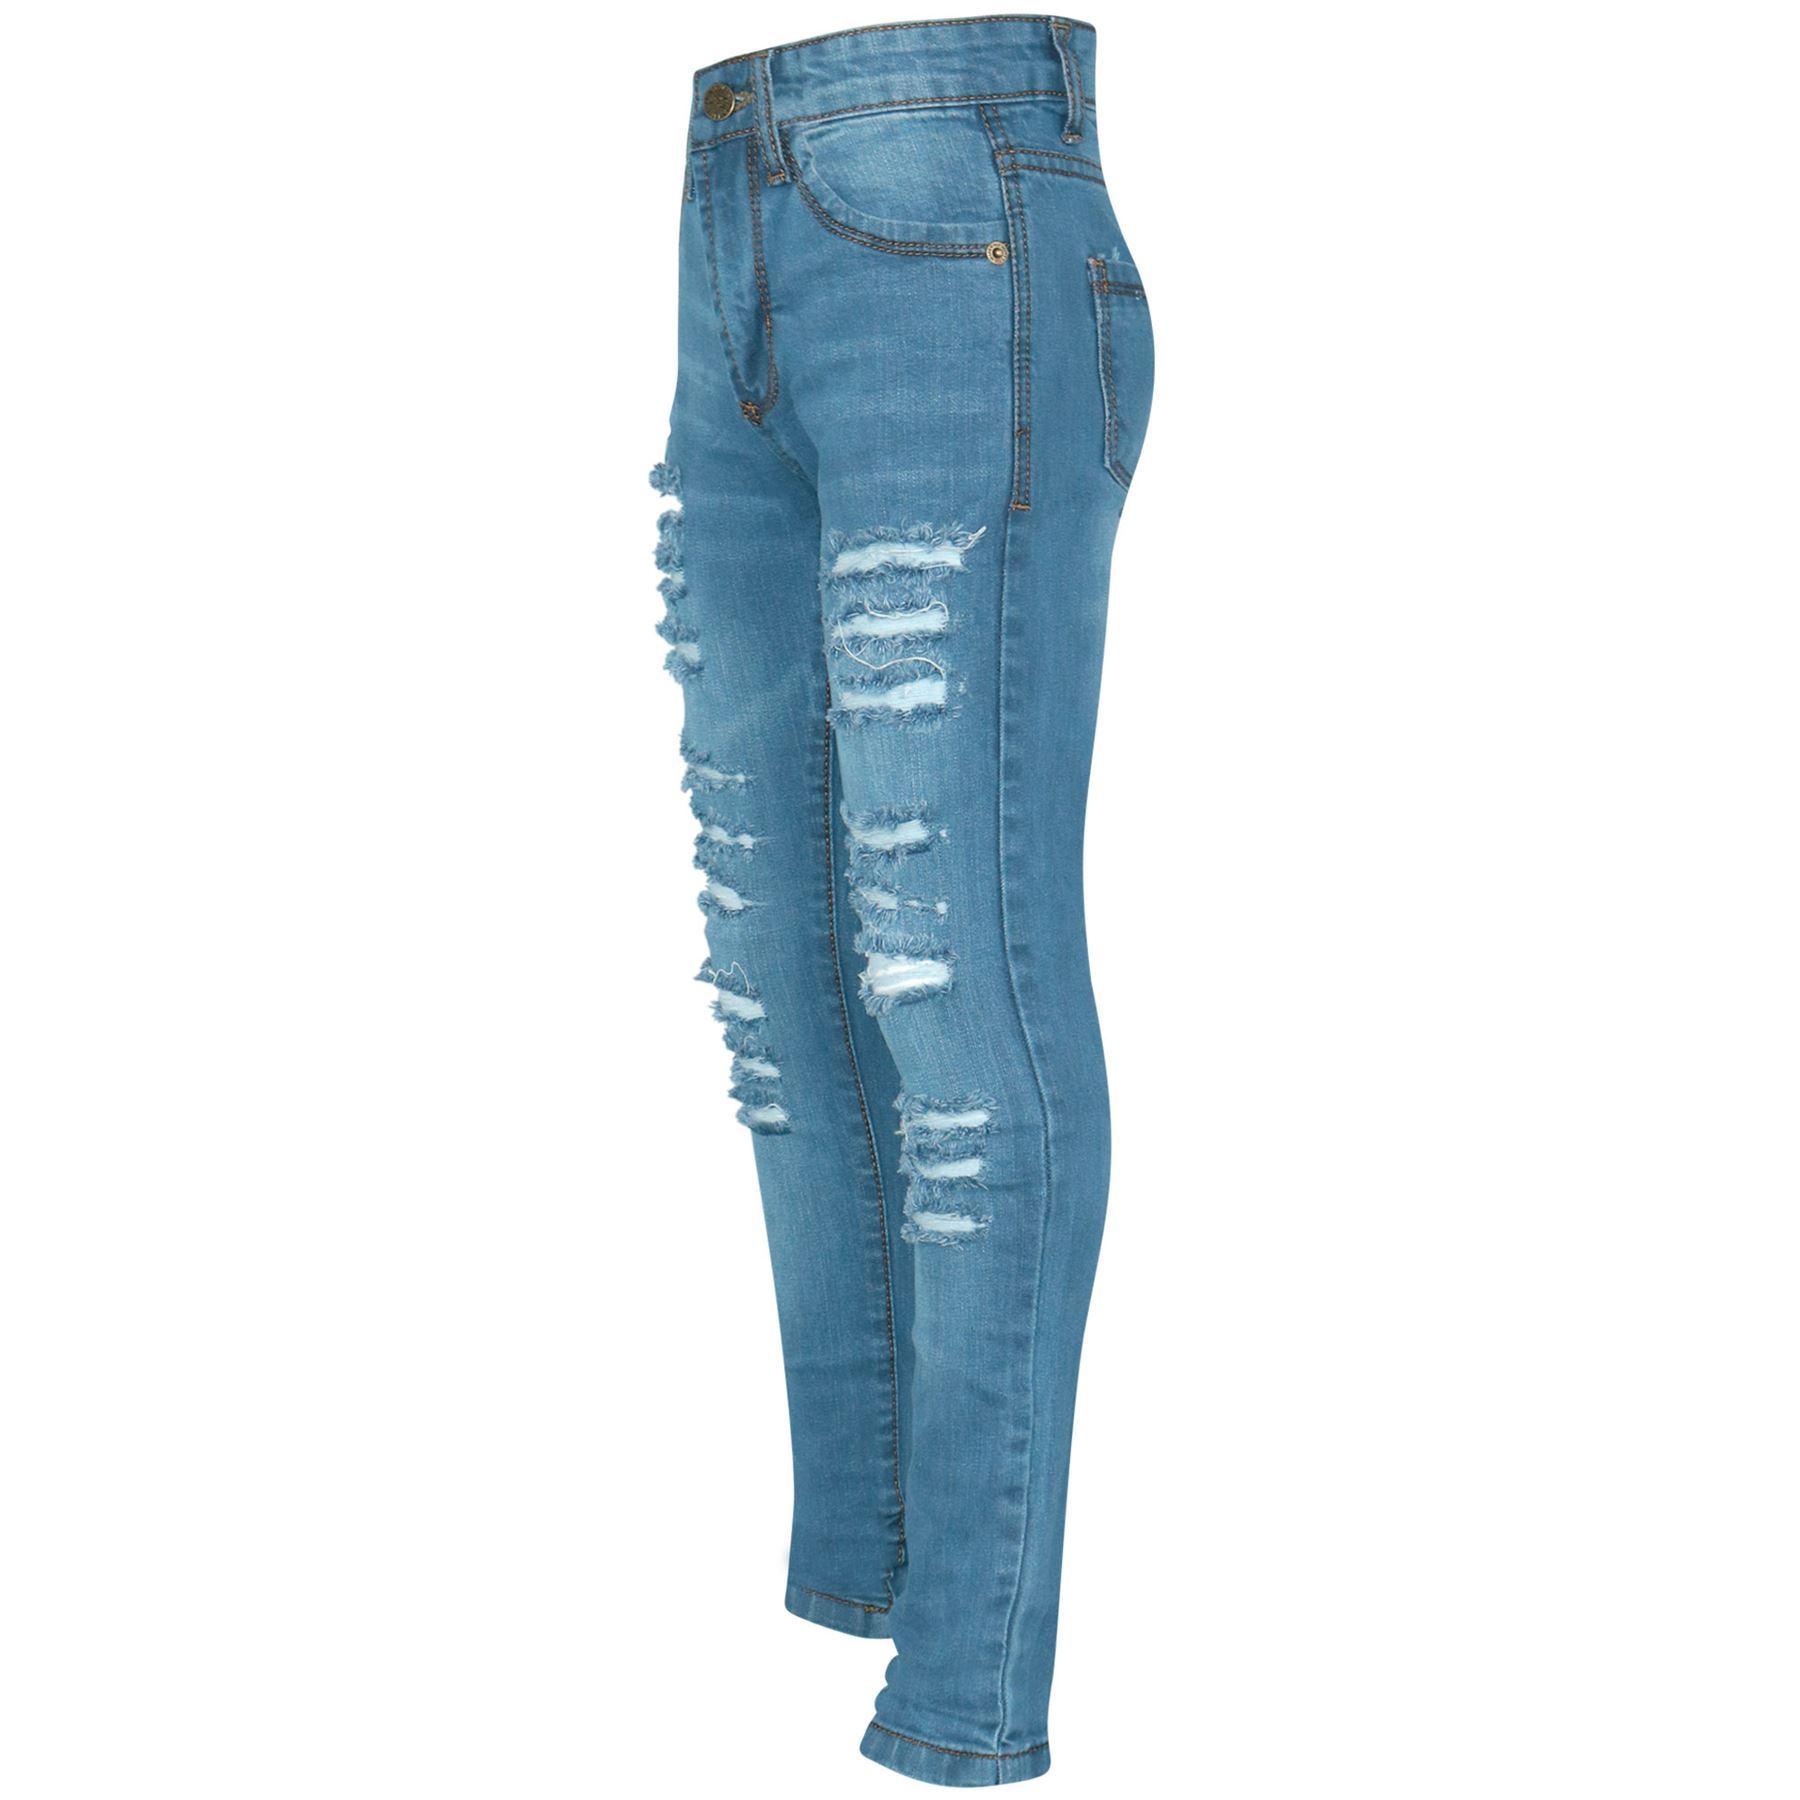 Kids Girls Light Blue Skinny Jeans Denim Ripped Fashion Stretchy Pants Jeggings